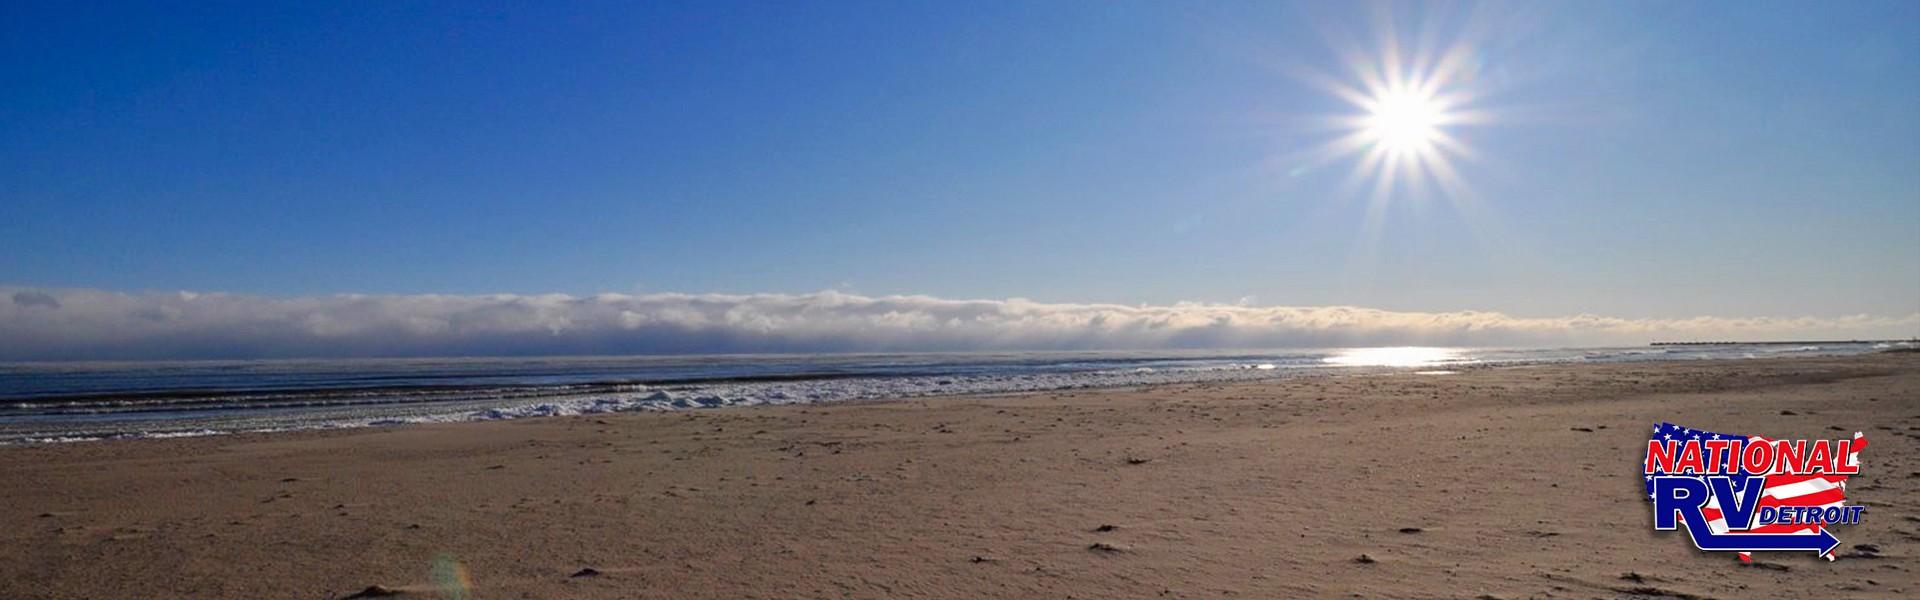 Cheboygan State Park beach view